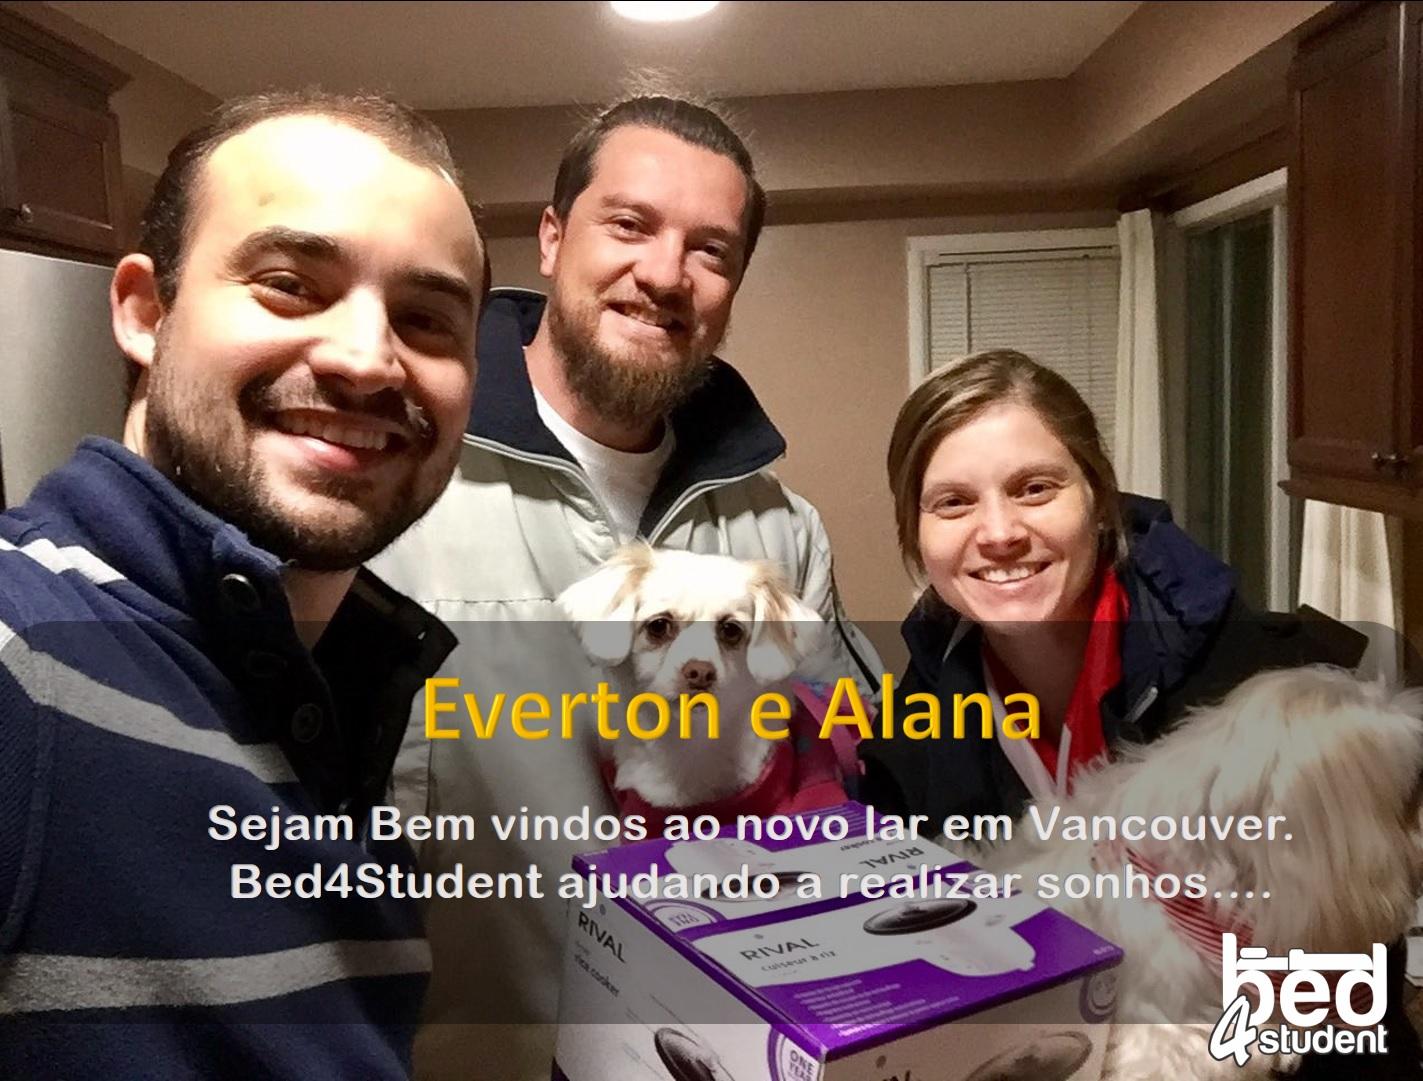 Everton e Alana